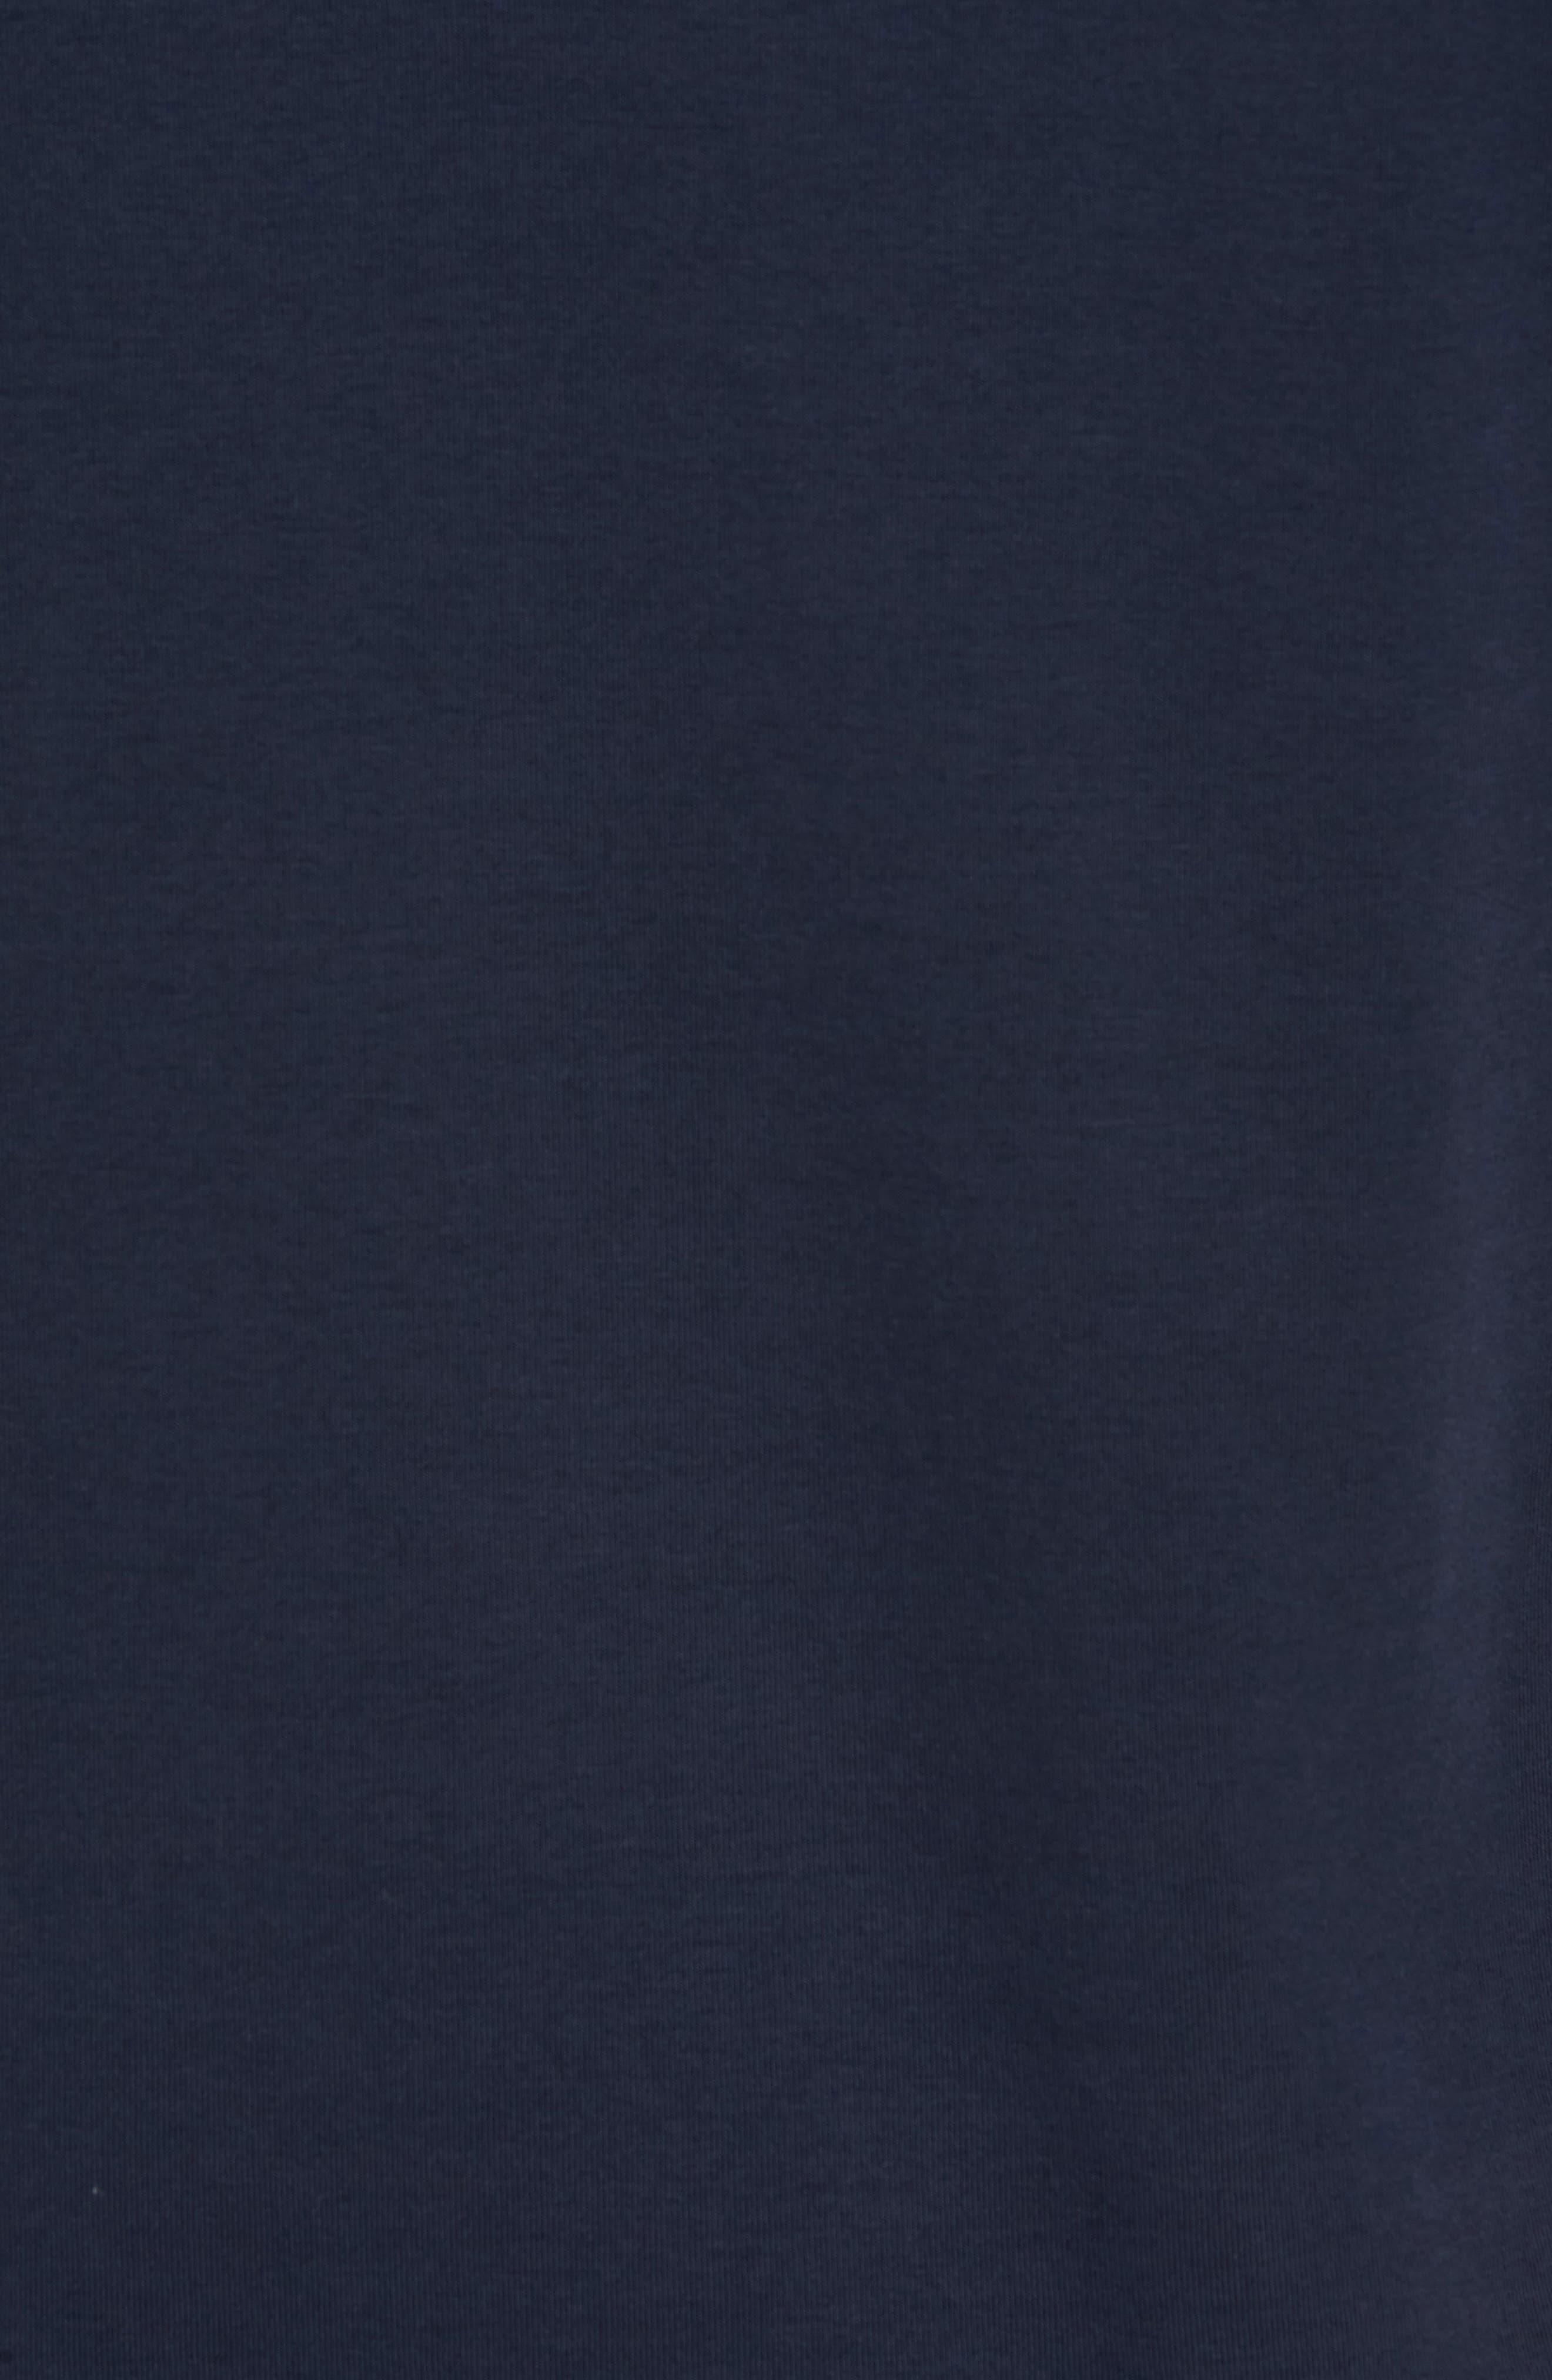 Regular Fit Quarter Zip Pullover,                             Alternate thumbnail 5, color,                             Navy